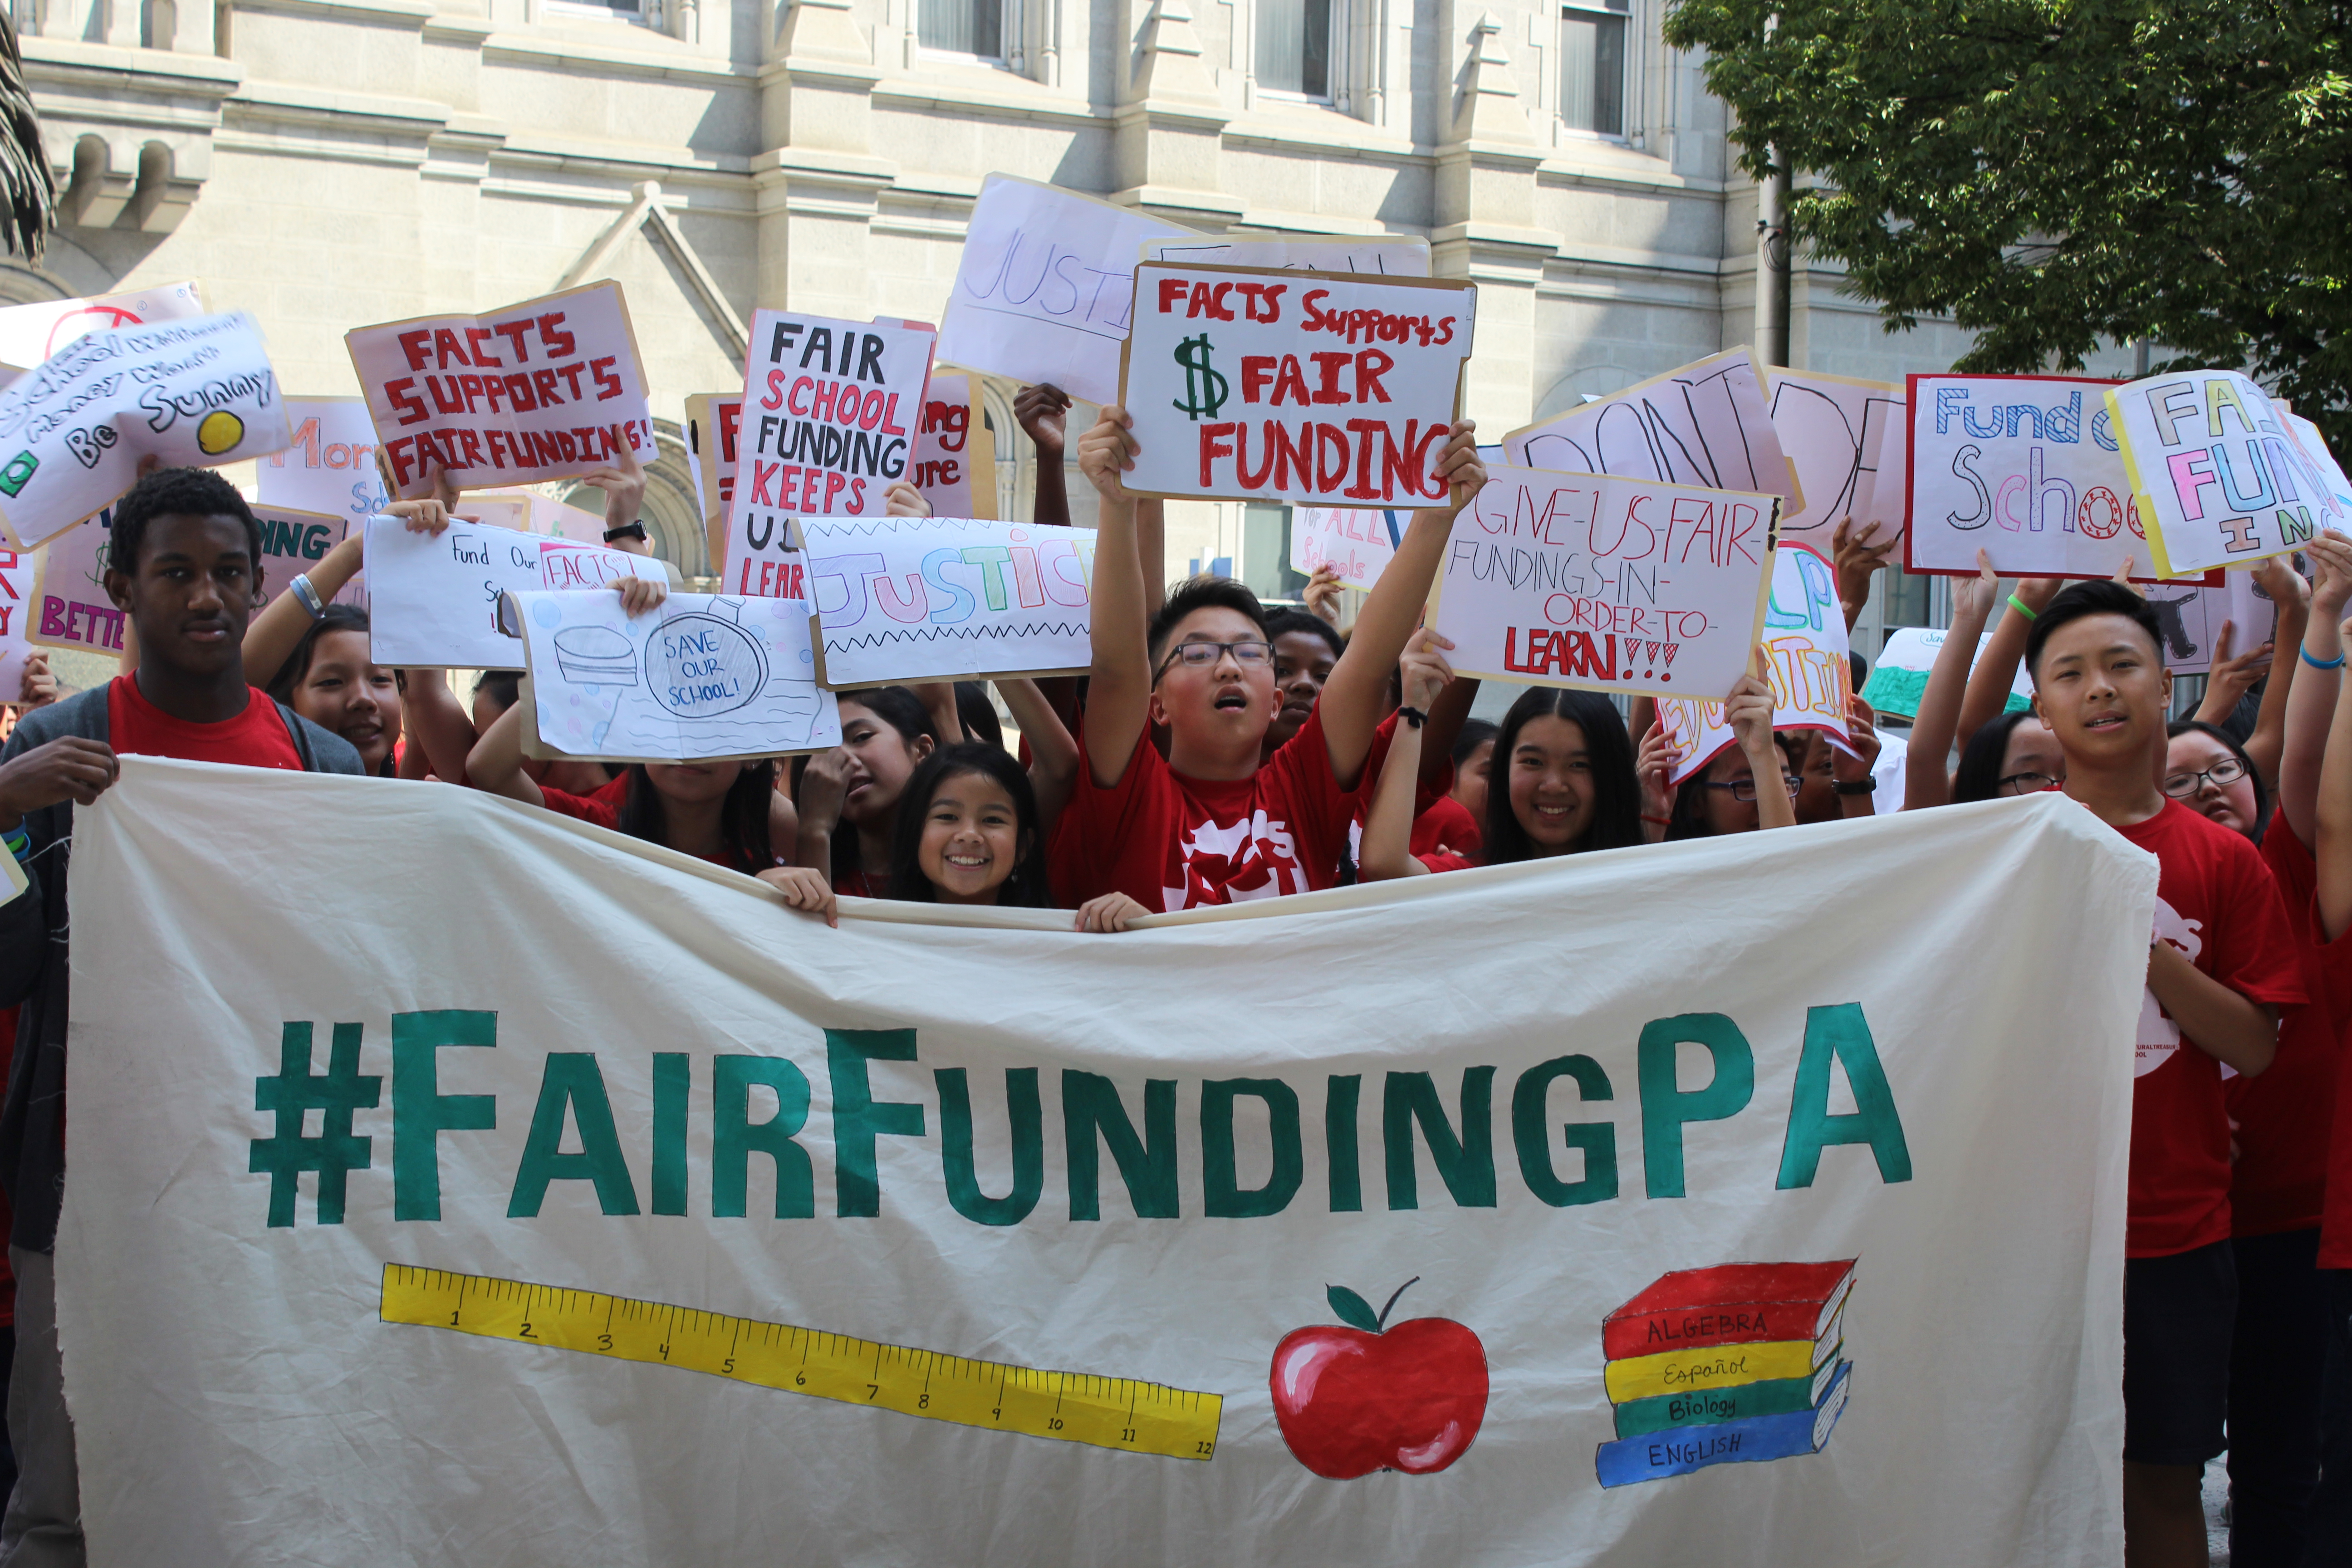 fair-funding-rally